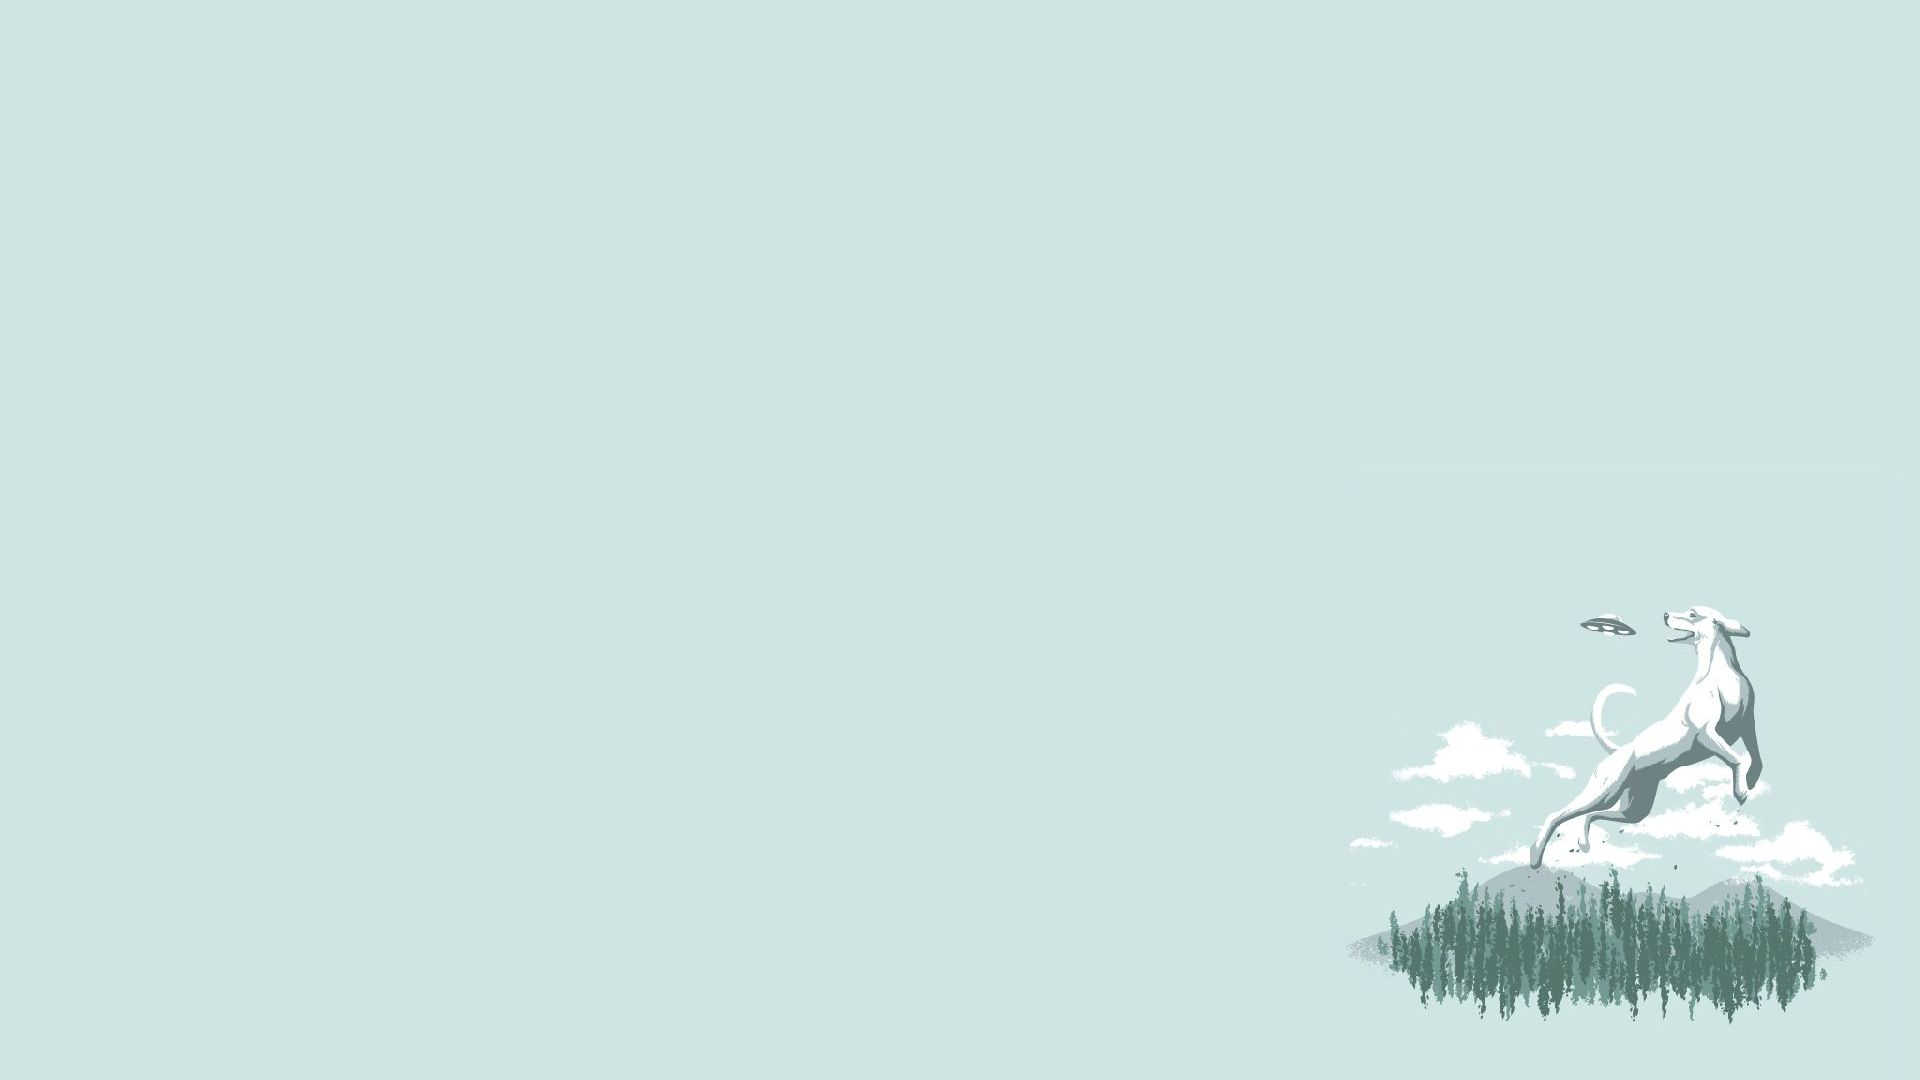 White Minimalism vertical wallpaper hd